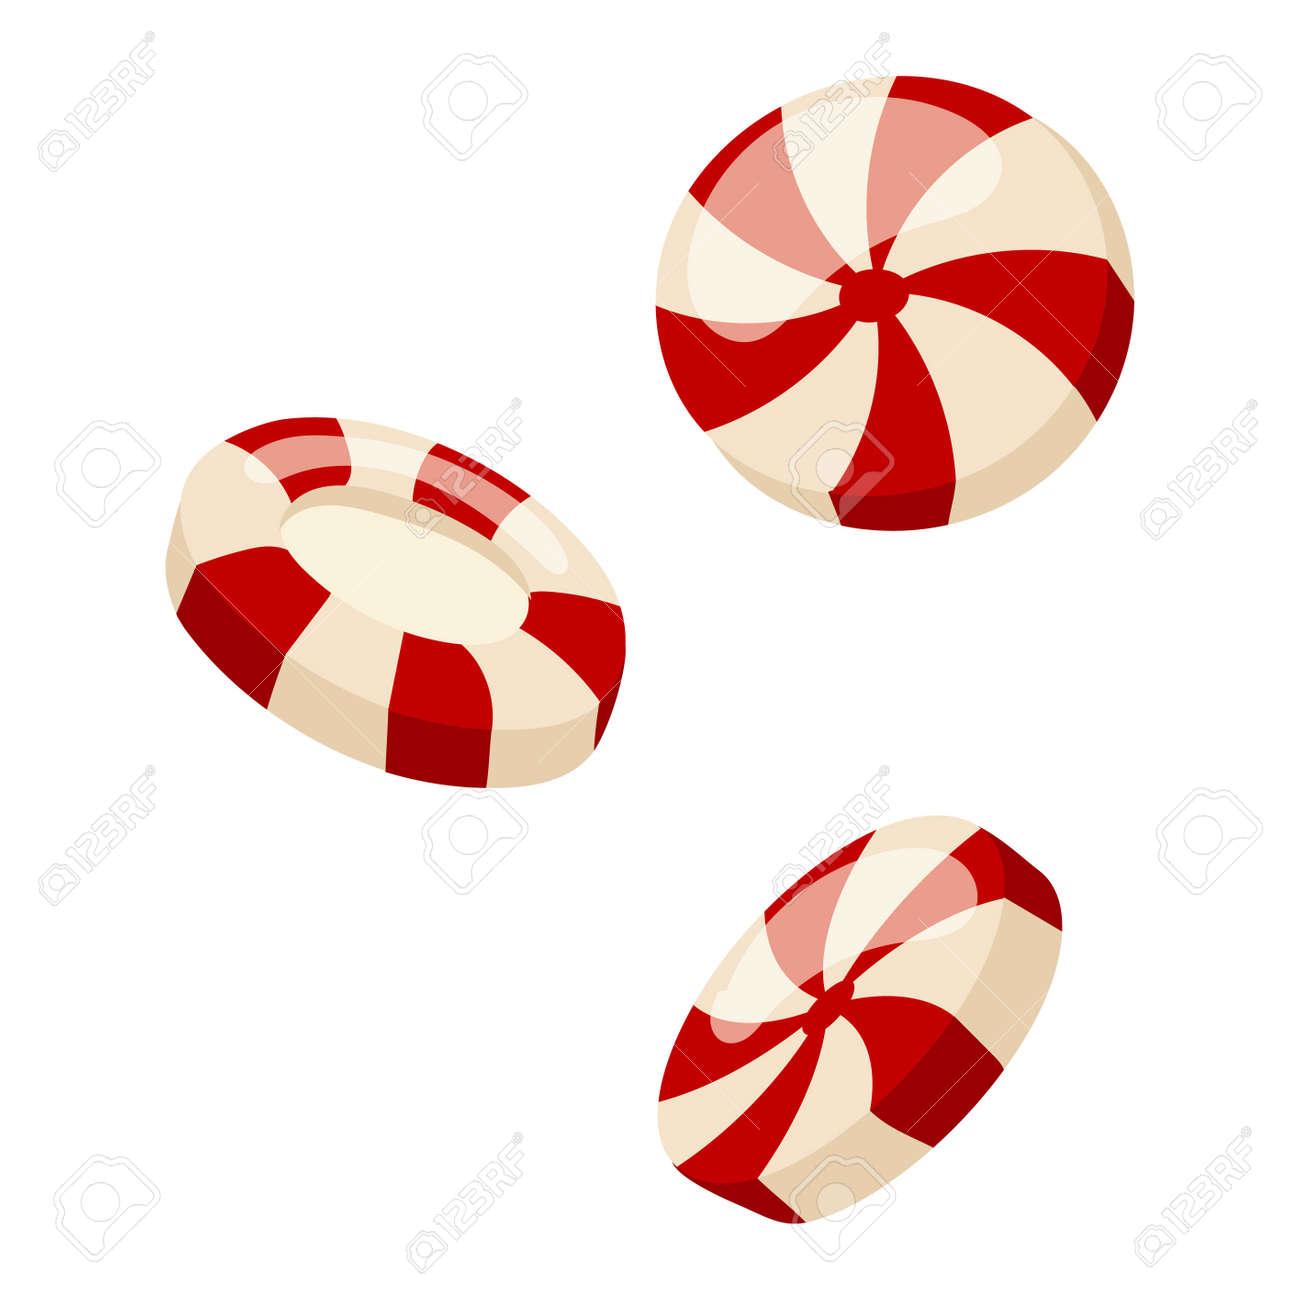 Lollipop süße Lebensmittel Vektor Illustration. Bunte Lutscher auf weißem  Vektor Illustration isoliert. Lollipop Kandiszucker süßen Bonbons. Lollipop  ...